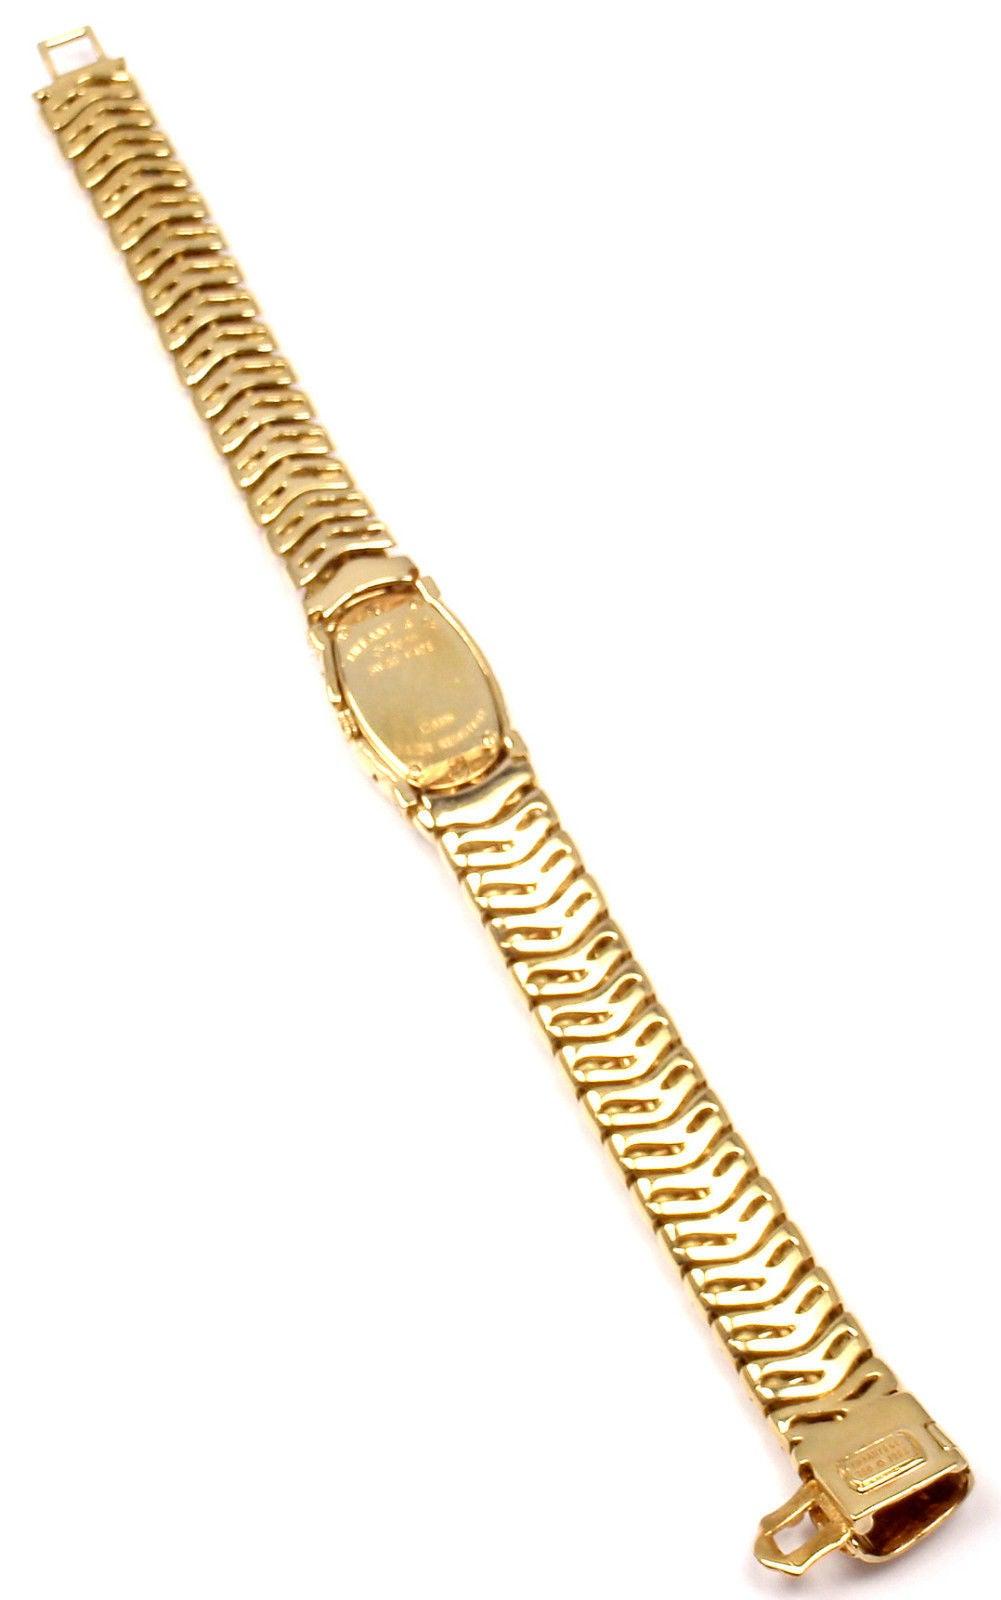 Tiffany & Co. Lady's Yellow Gold Diamond Basket Weave Quartz Wristwatch 5